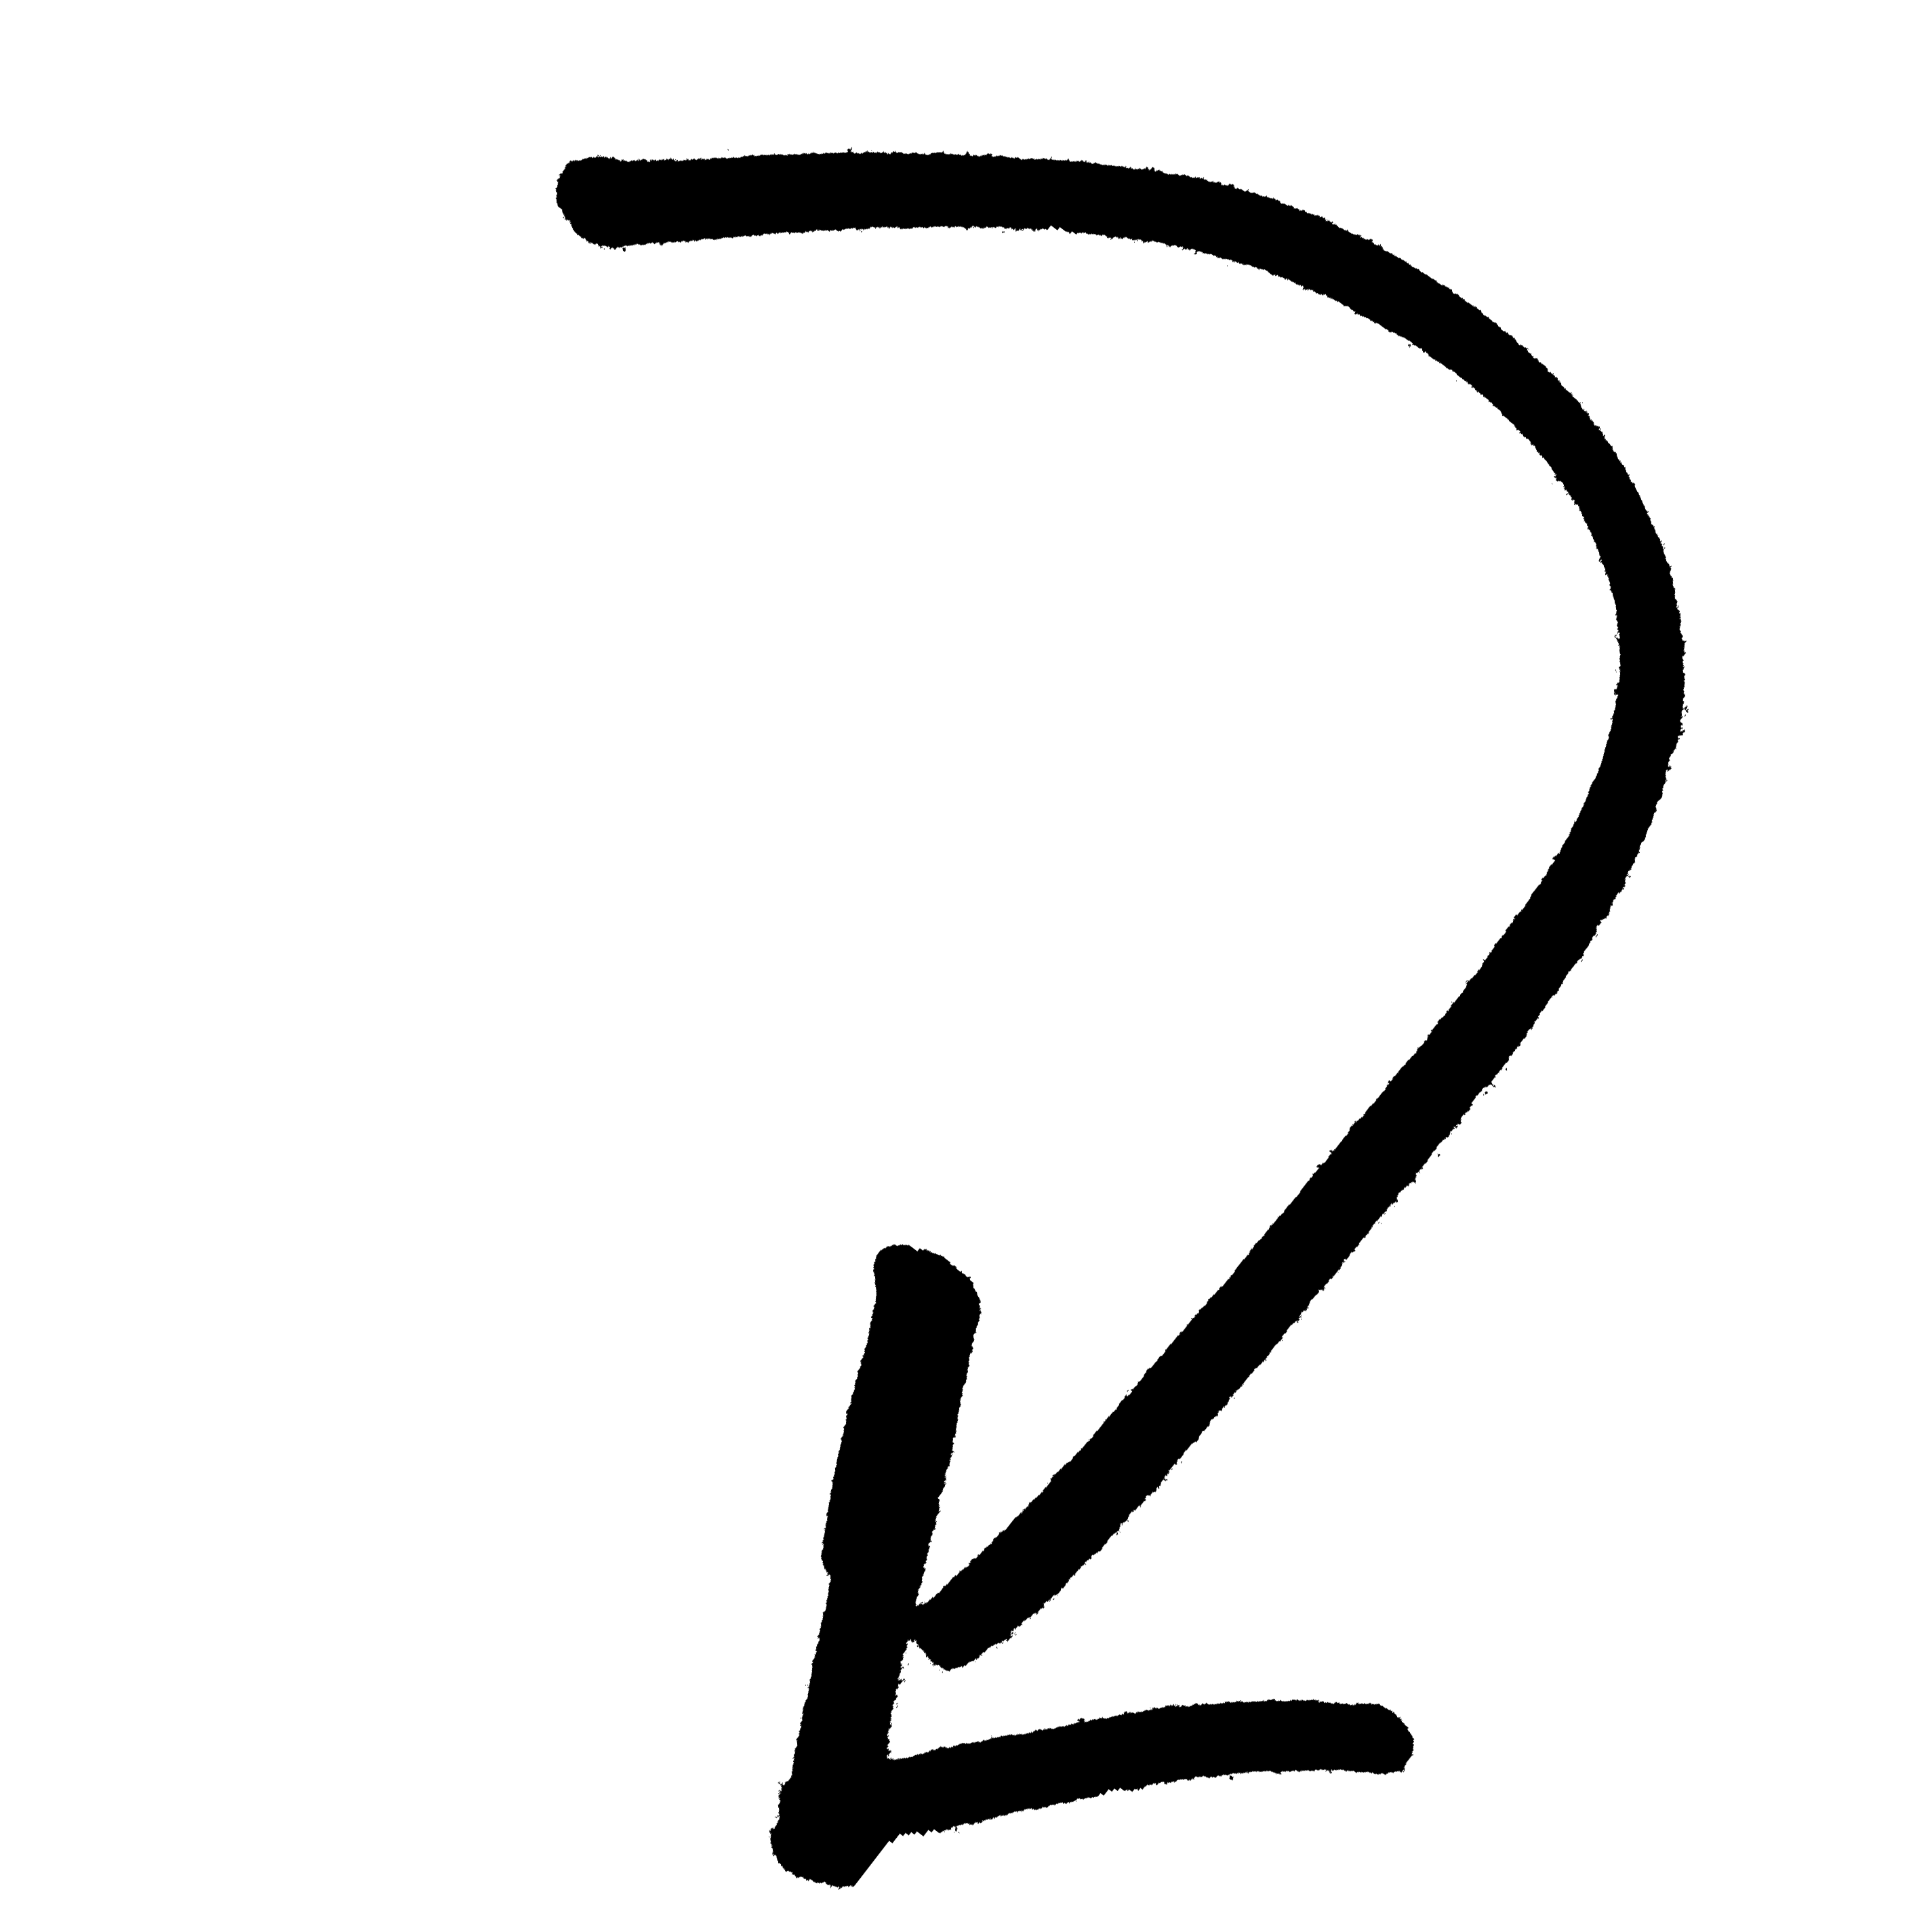 Drawn transparent abbie gaunt. Arrow clip art clear background